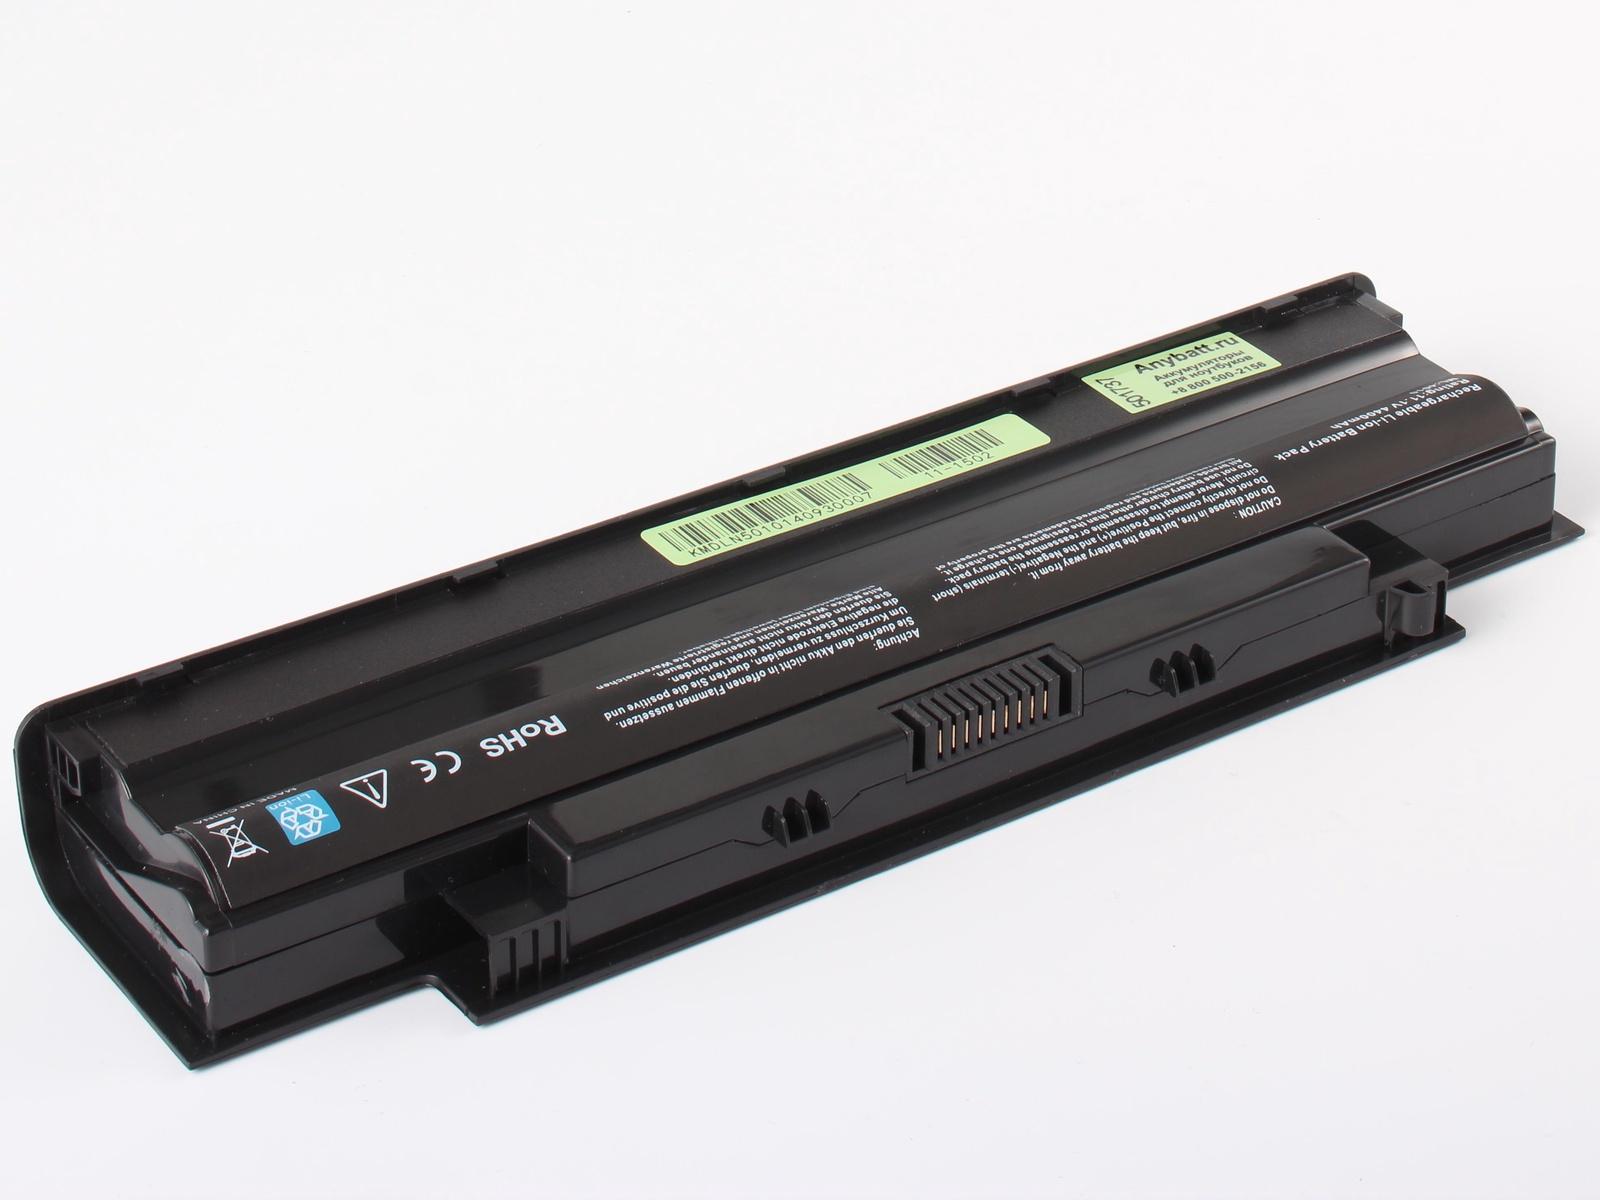 Фото - Аккумулятор для ноутбука AnyBatt Dell J1KND, 9T48V, J4XDH, JXFRP, 312-0233, 965Y7, 9TCXN, W7H3N, YXVK2, 4T7JN, 383CW, 312-0234, 451-11510 аккумуляторная батарея для ноутбуков dell primary 6 cell battery 60 whr для e5430 e5530 e6430 e6530 451 11977 t54fj